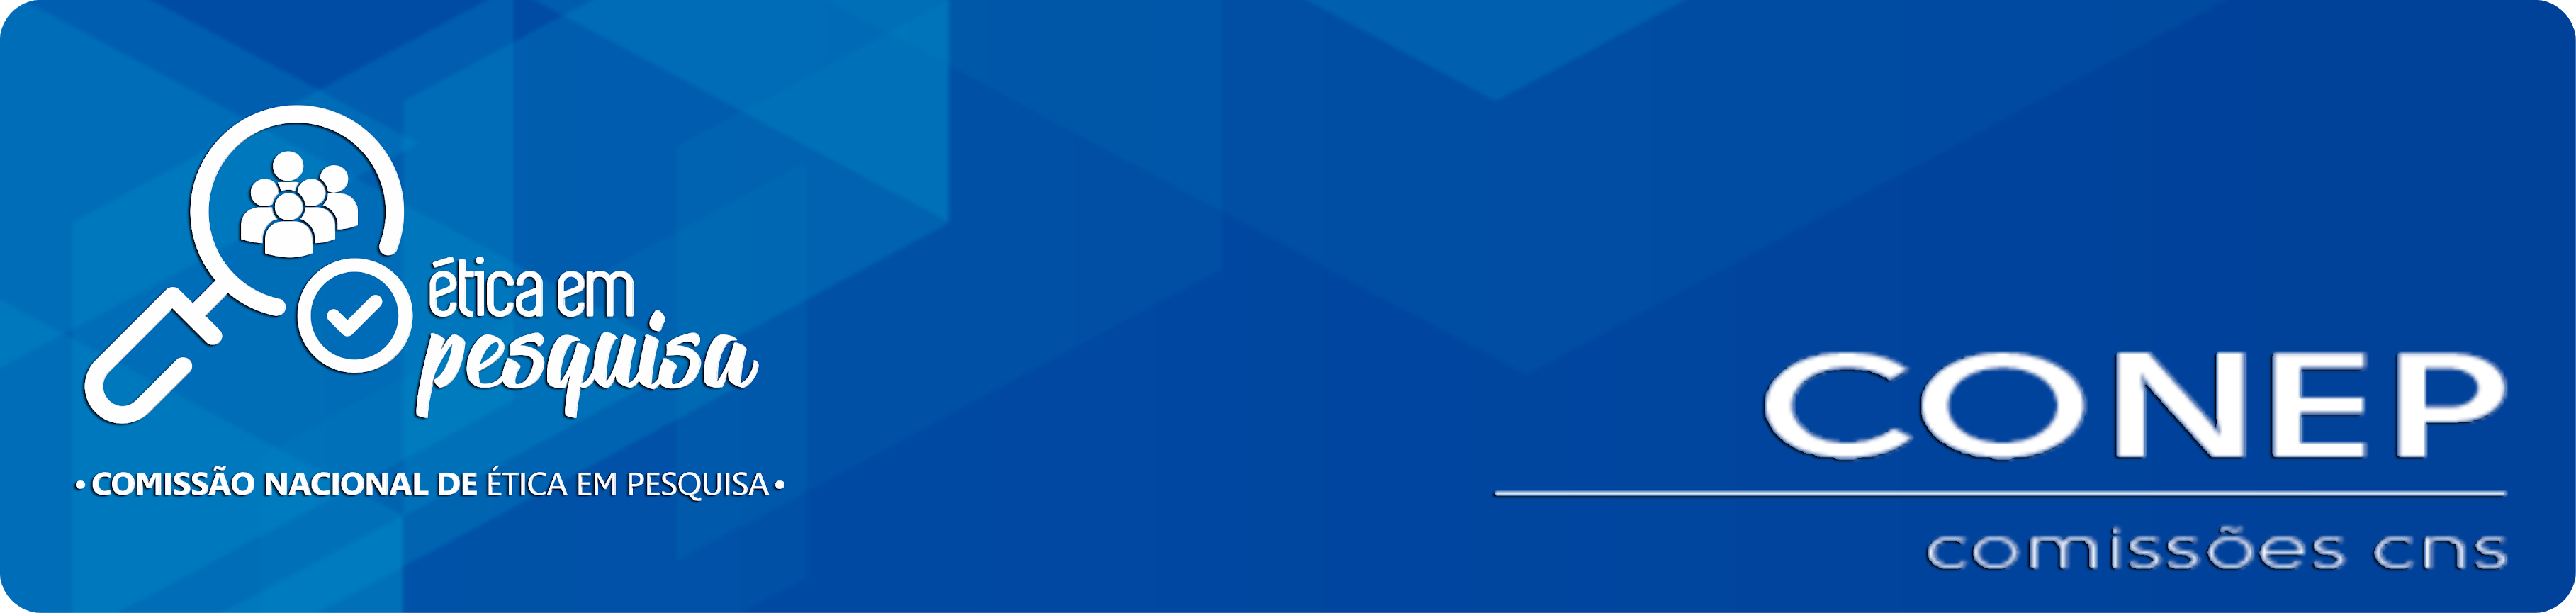 Encontro Nacional e Virtual de CEP/ENCEP acontece no dia 17/12. Participe!